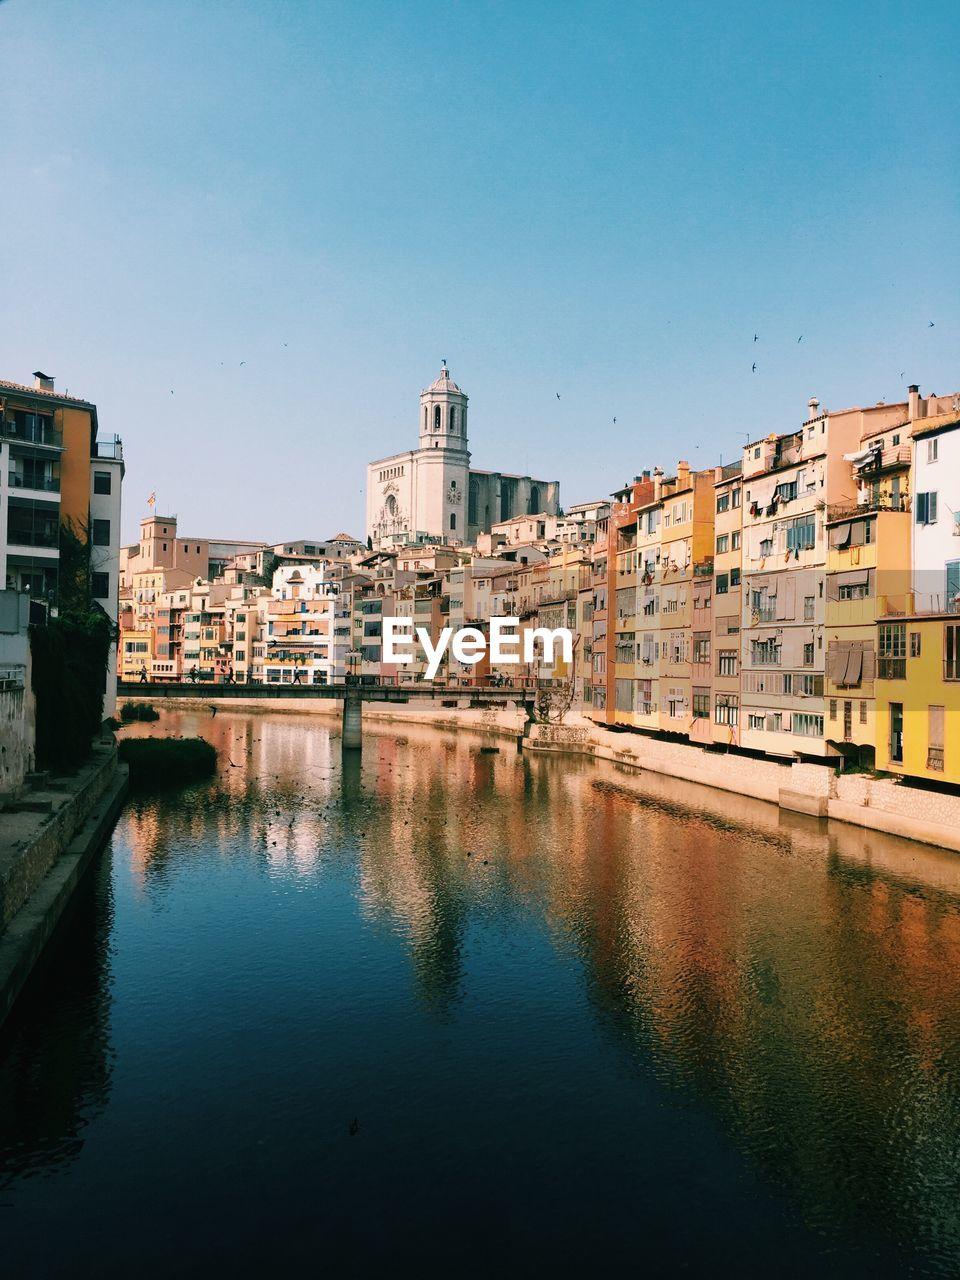 Onyar river amidst buildings against clear blue sky